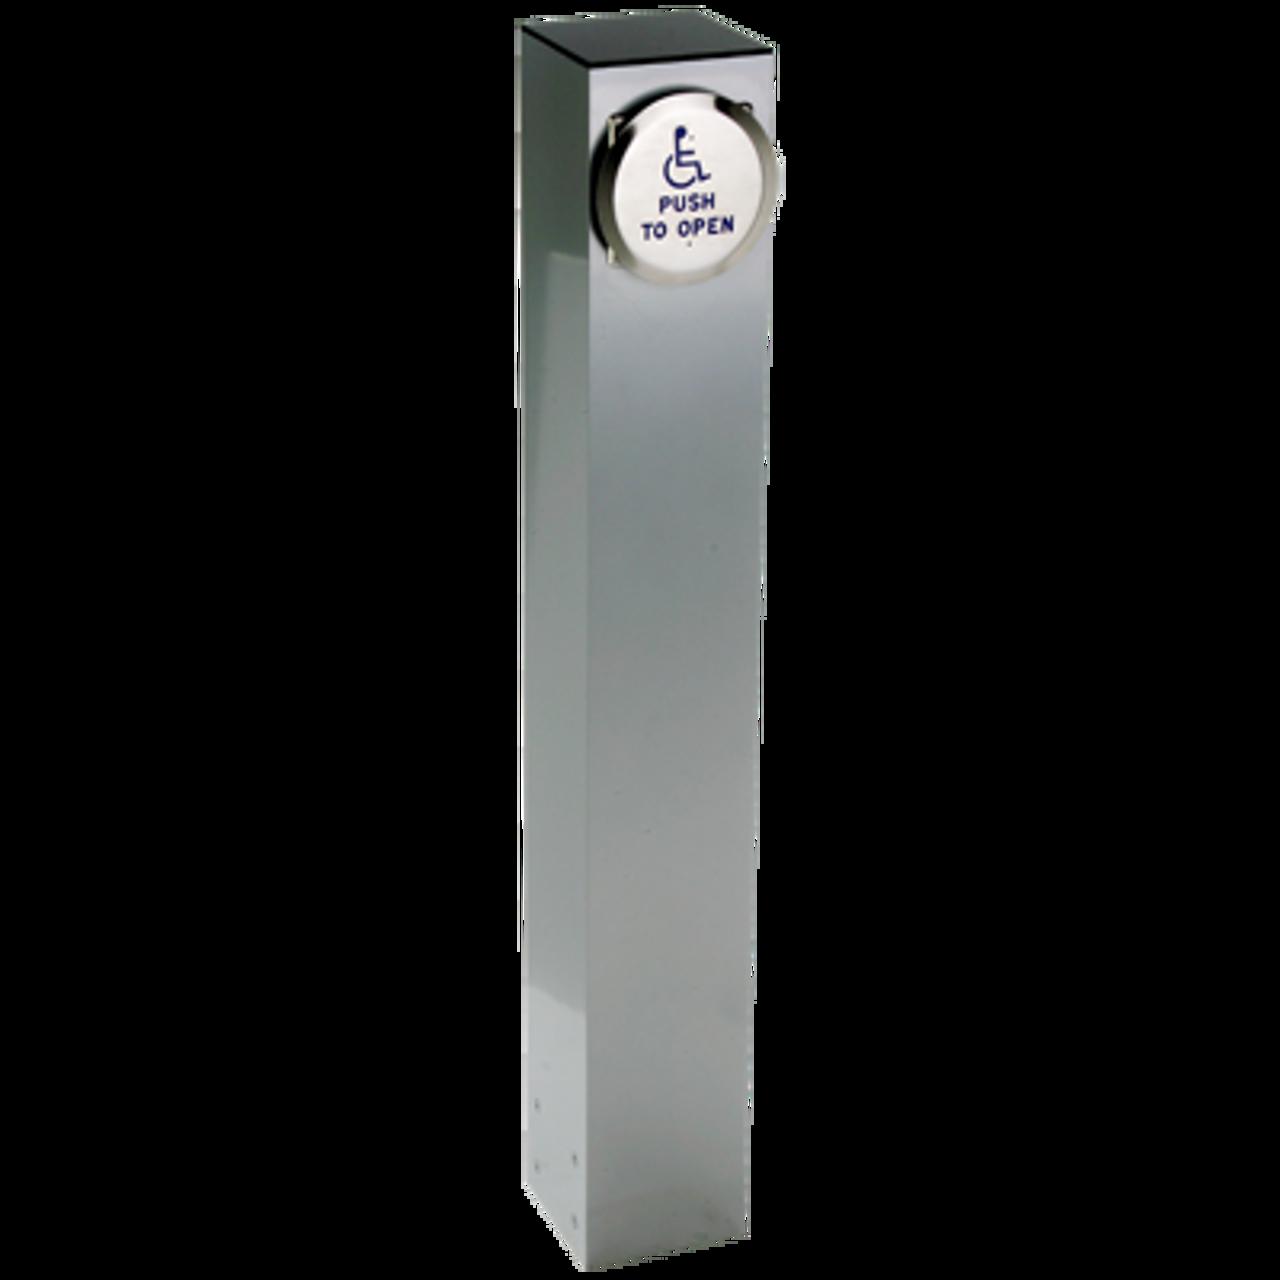 54 Quot X 6 Quot Square Bollard With Push Plate Actuator Careprodx